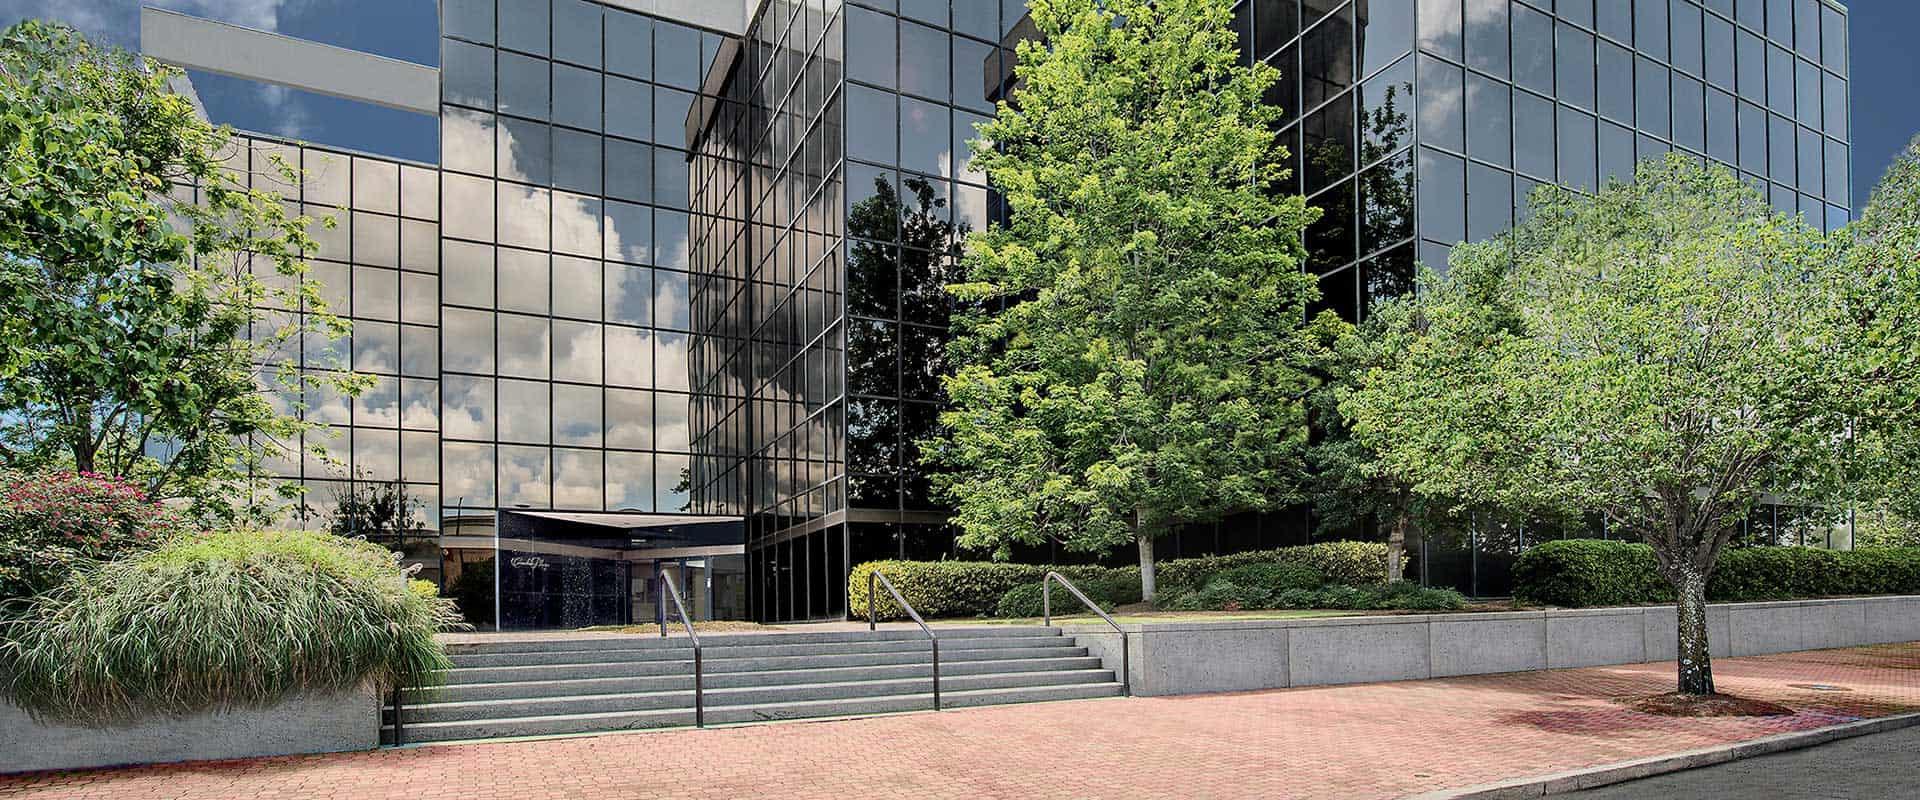 Carmike Office Building Columbus, GA prestegious office space